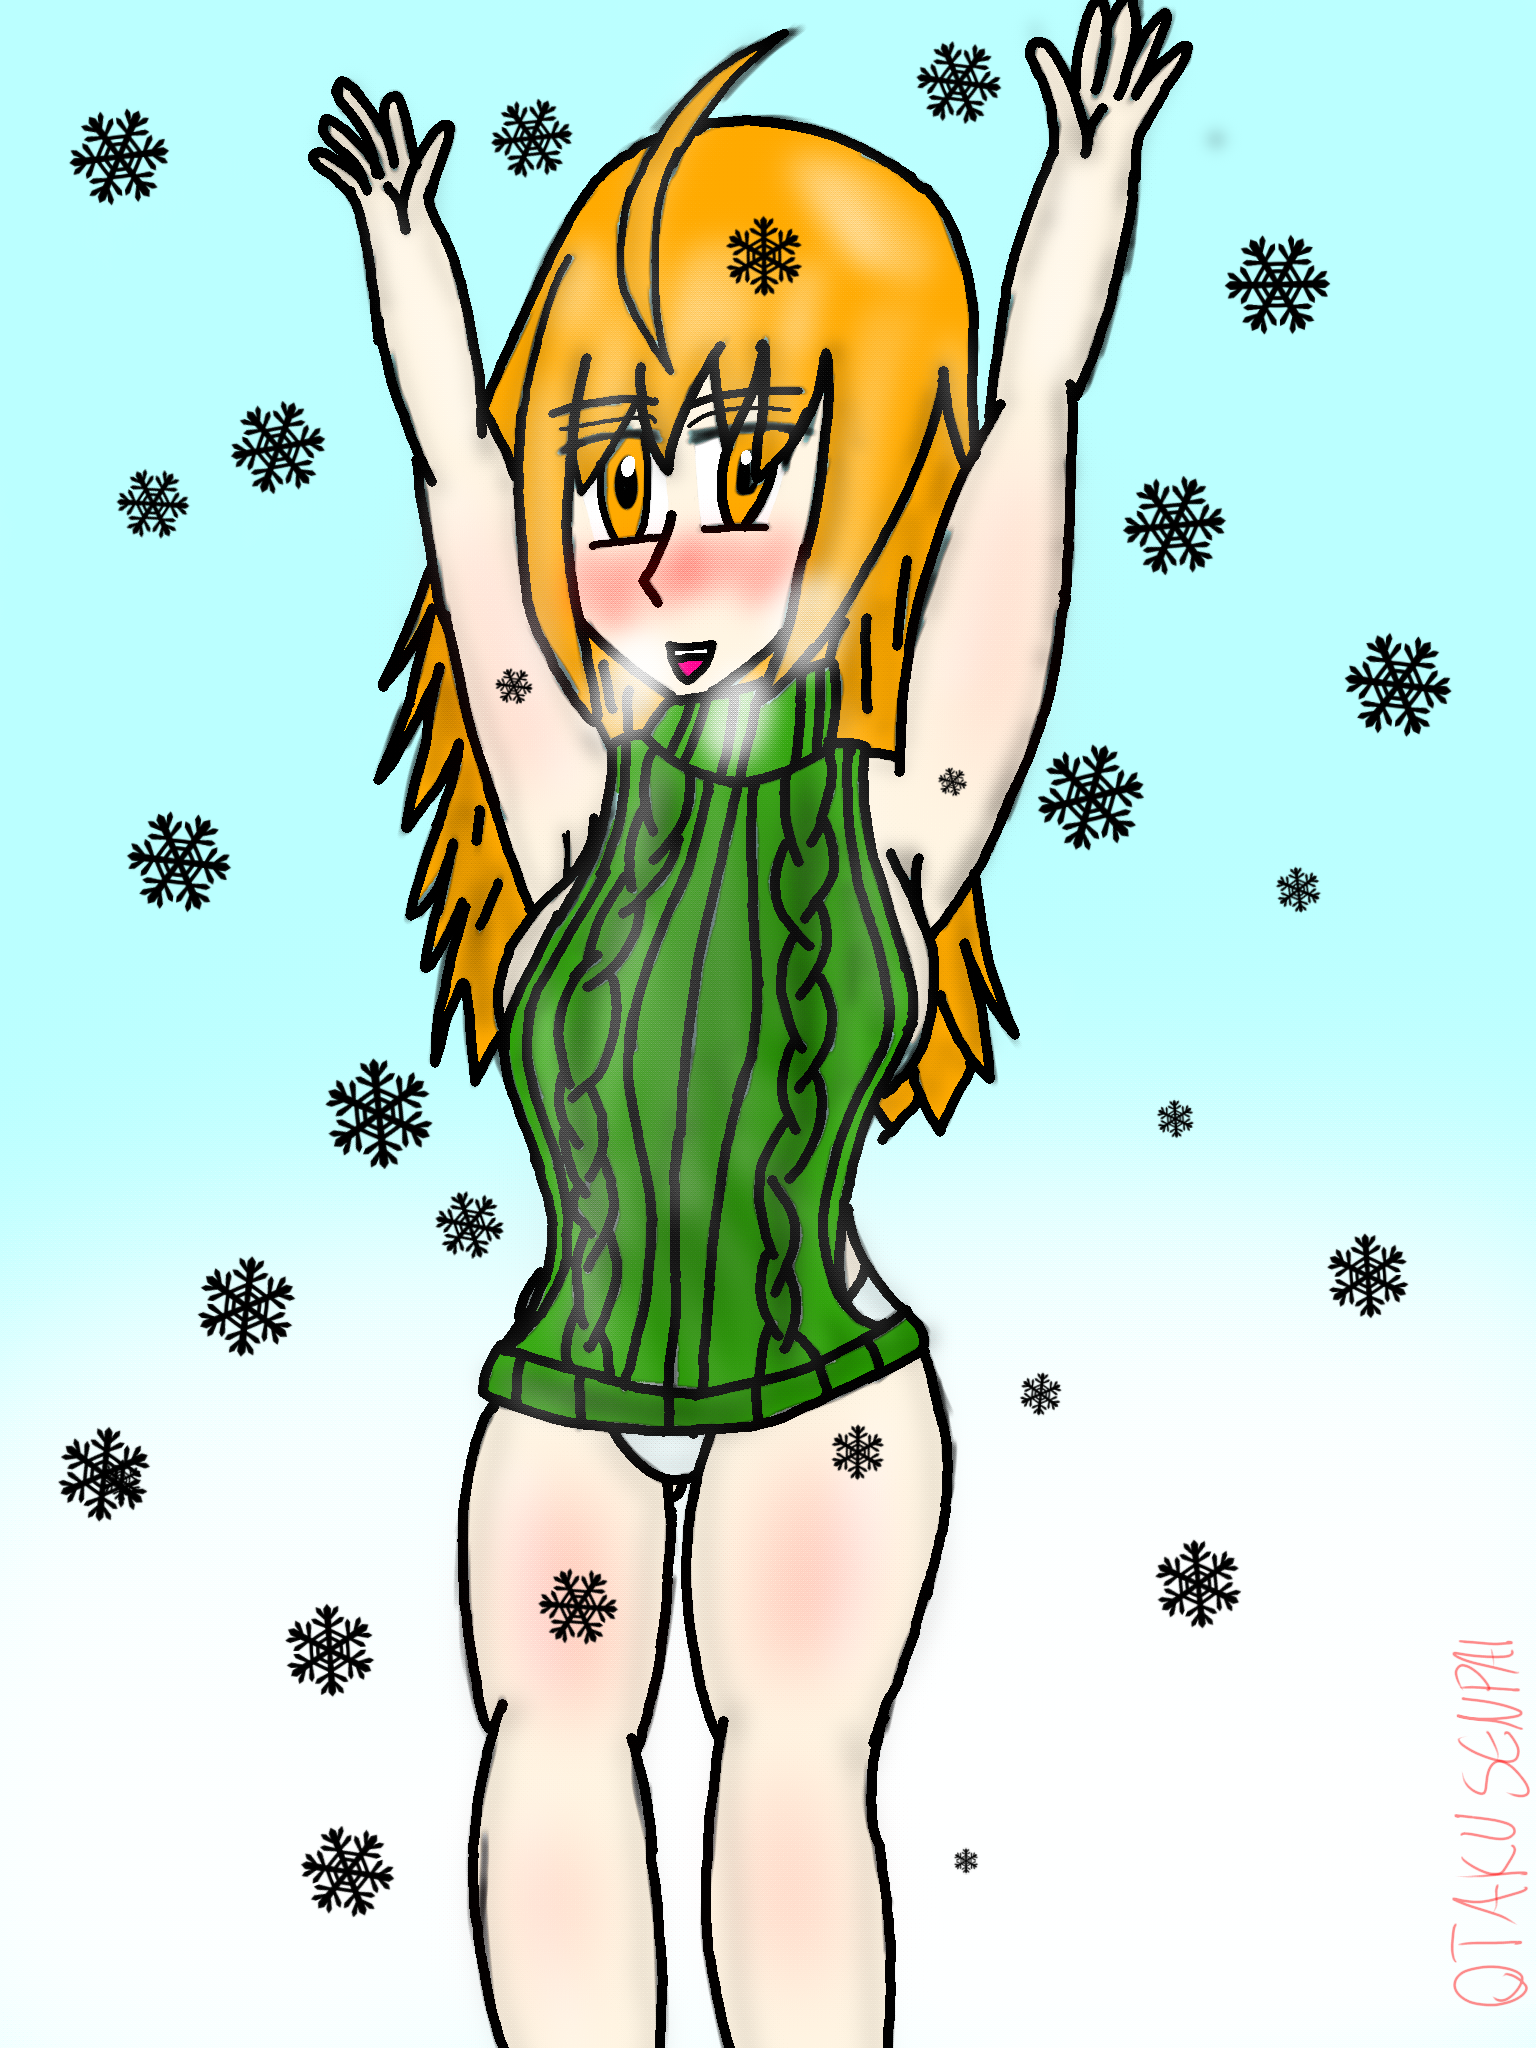 Virgin Killer Sweater Meme (IN THE SNOW)